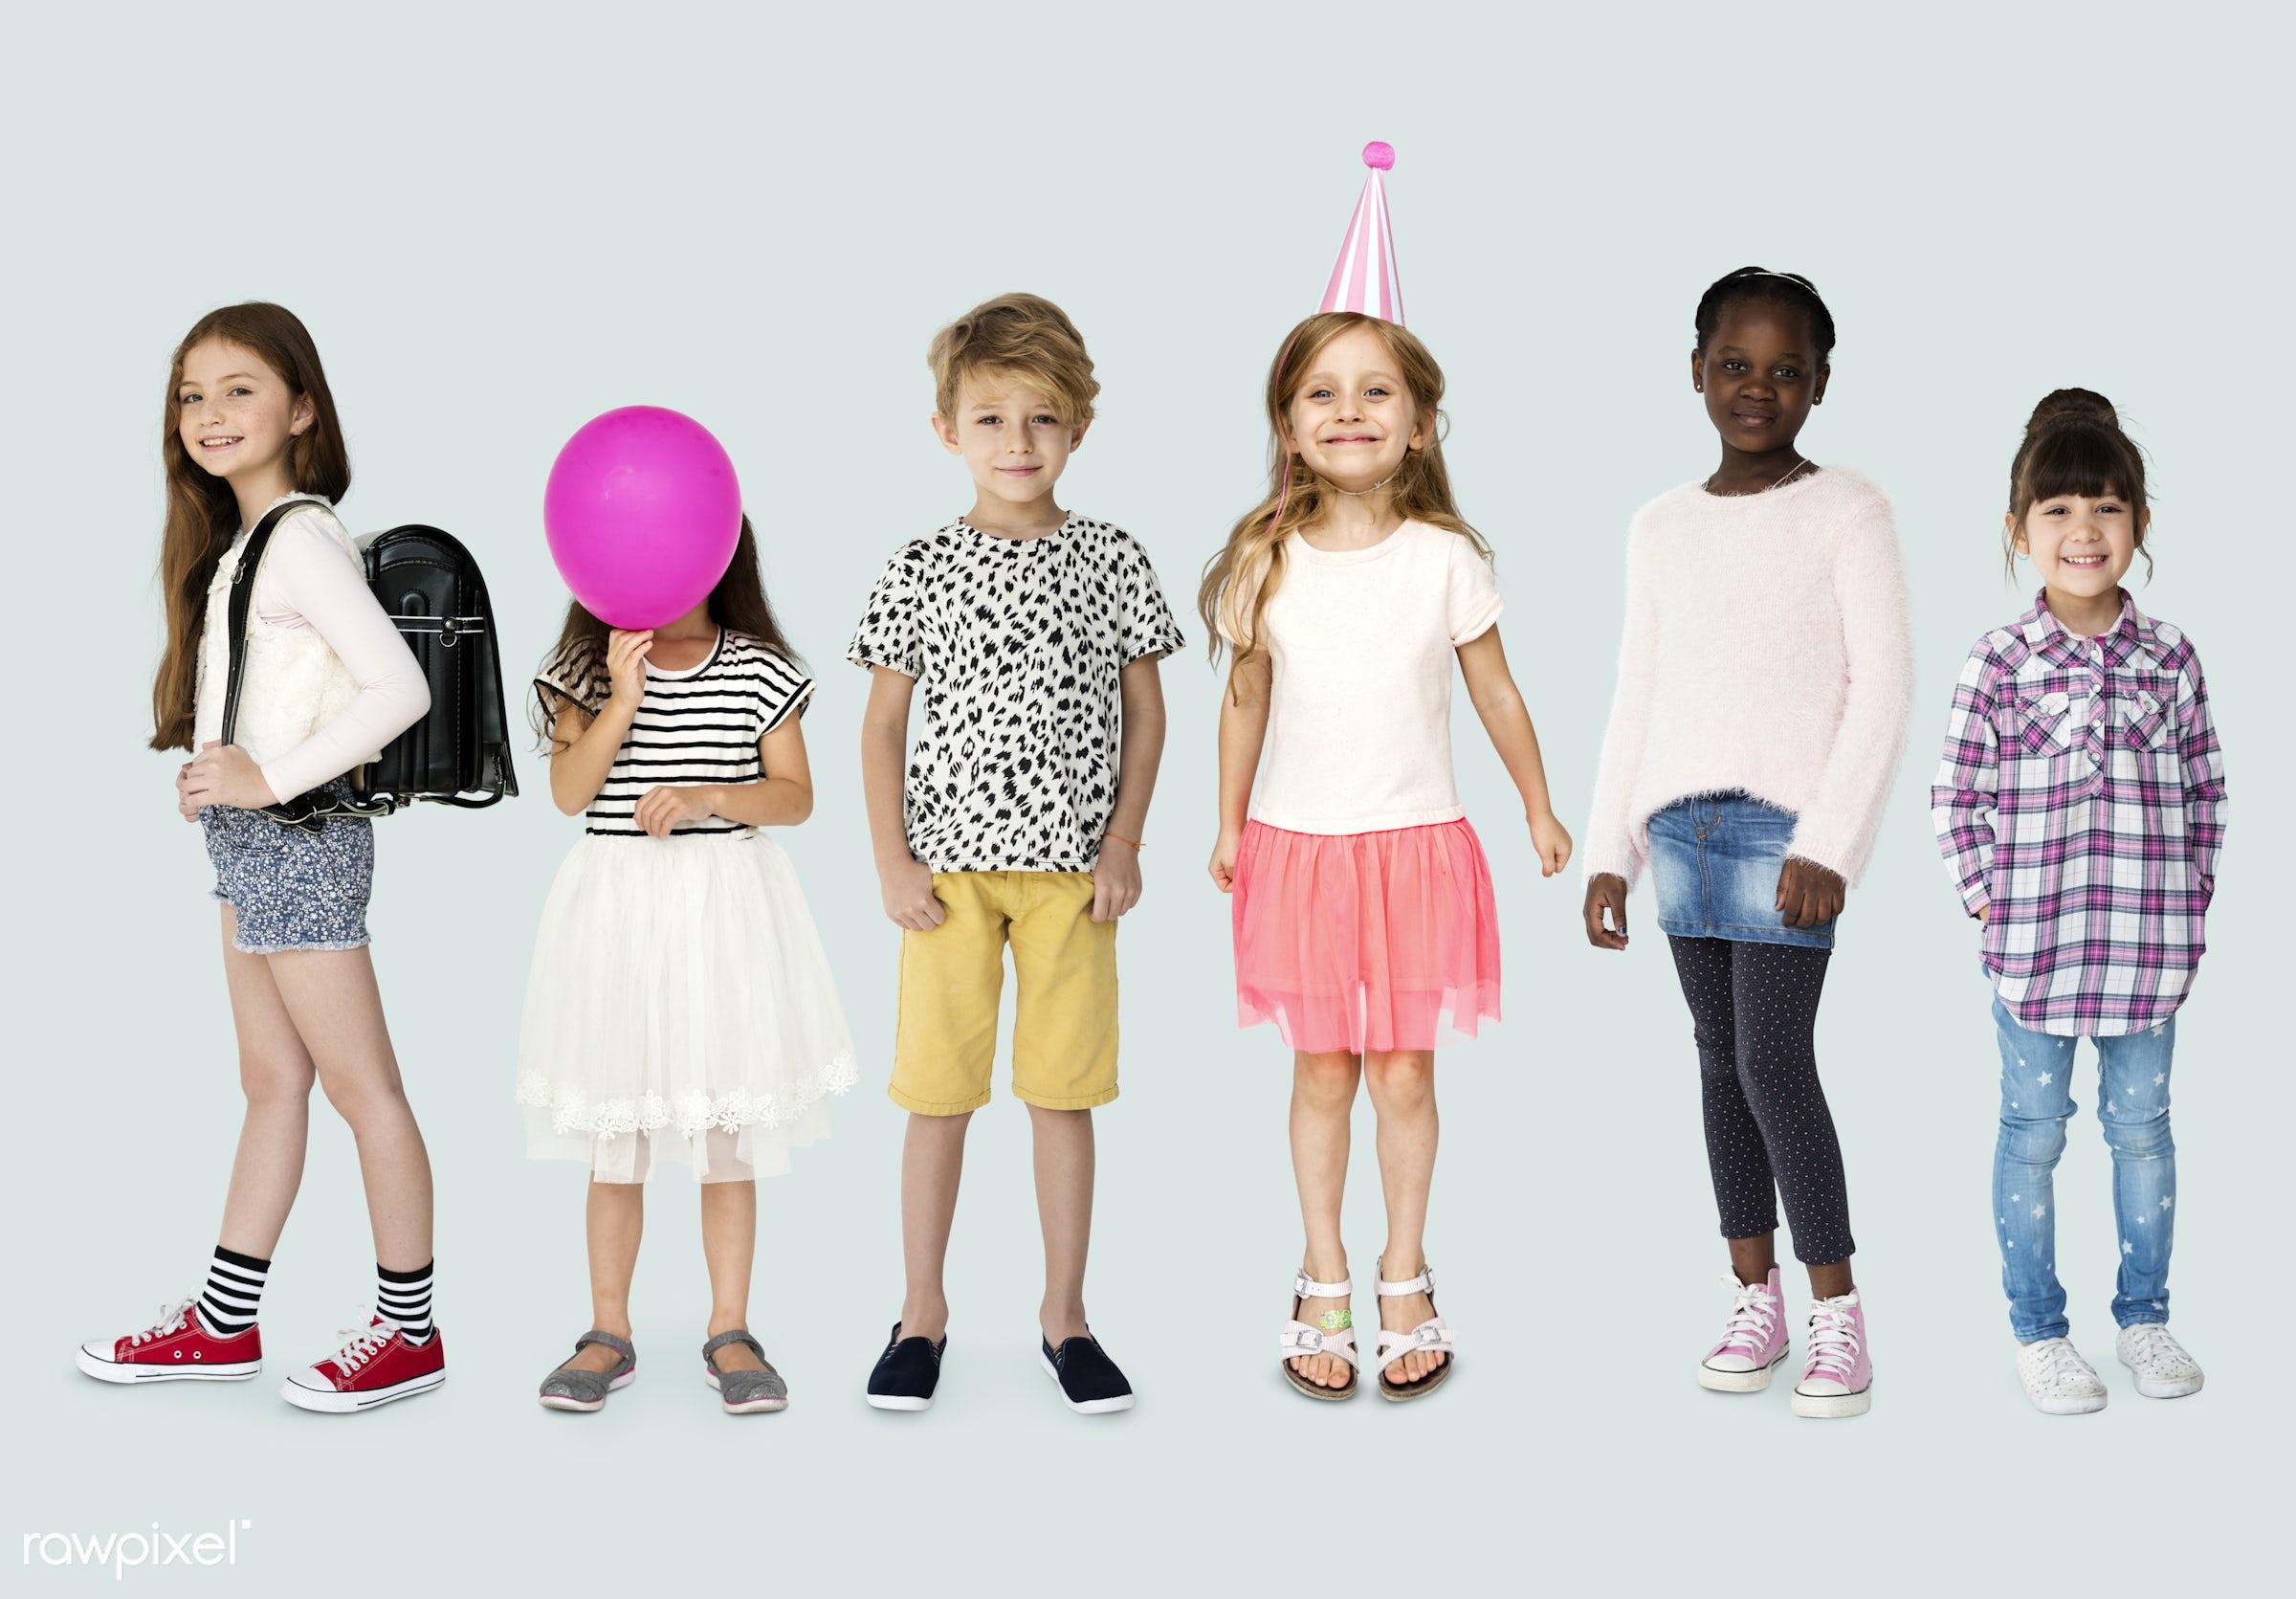 studio, person, diverse, innocent, little, entertain, recreation, people, caucasian, asian, little girls, lifestyle,...